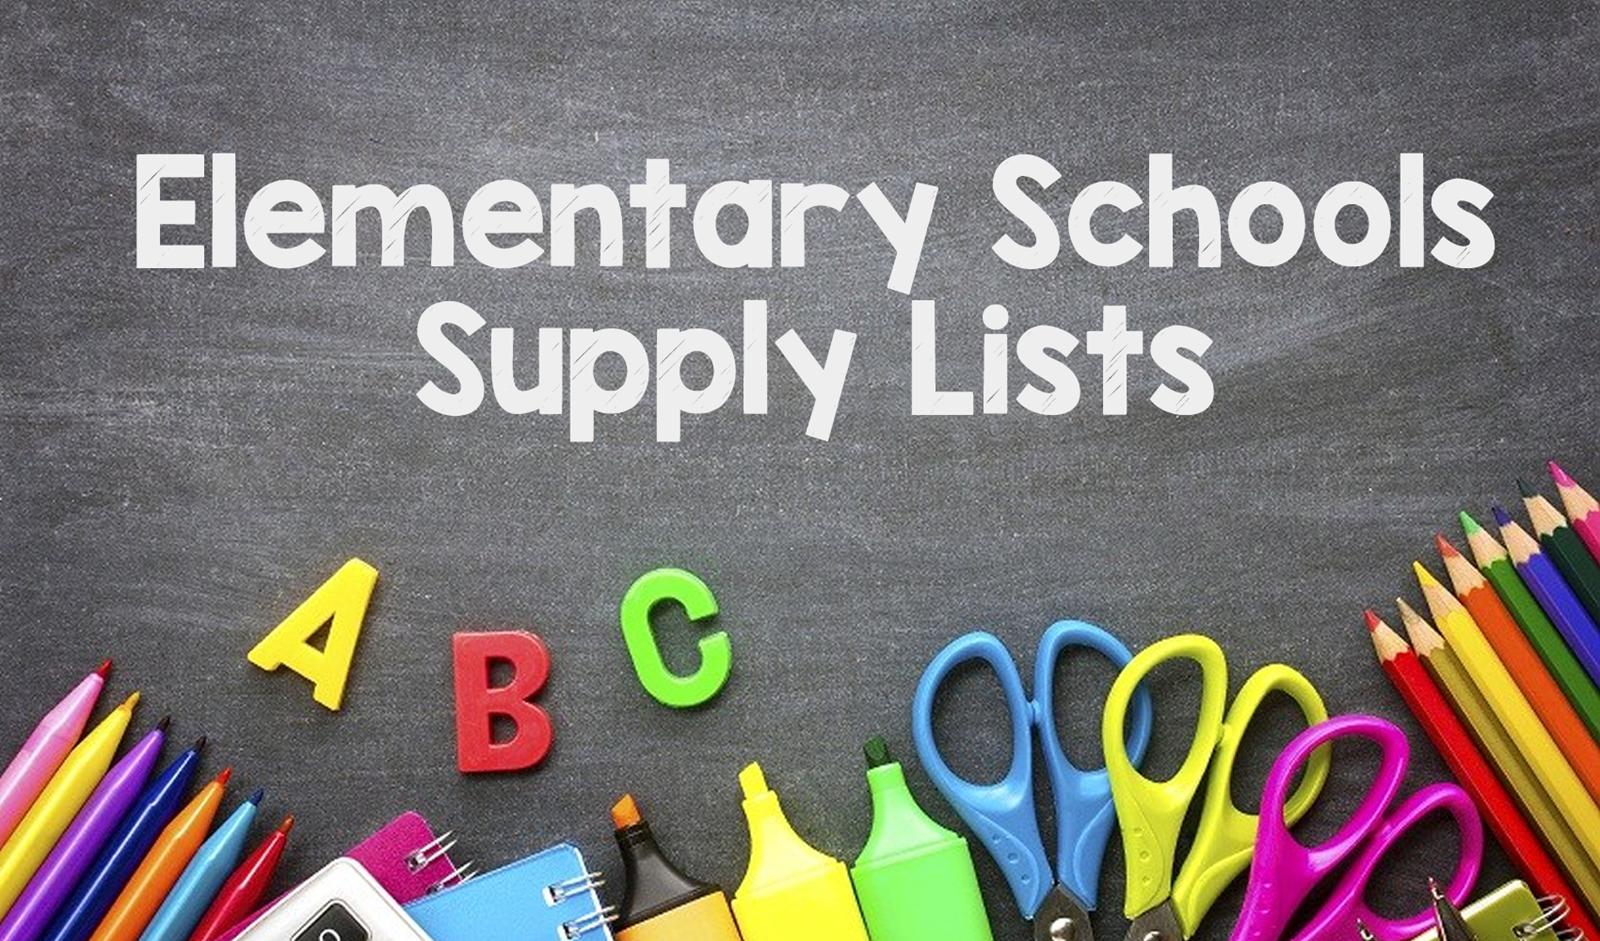 Elementary Schools Supply Lists